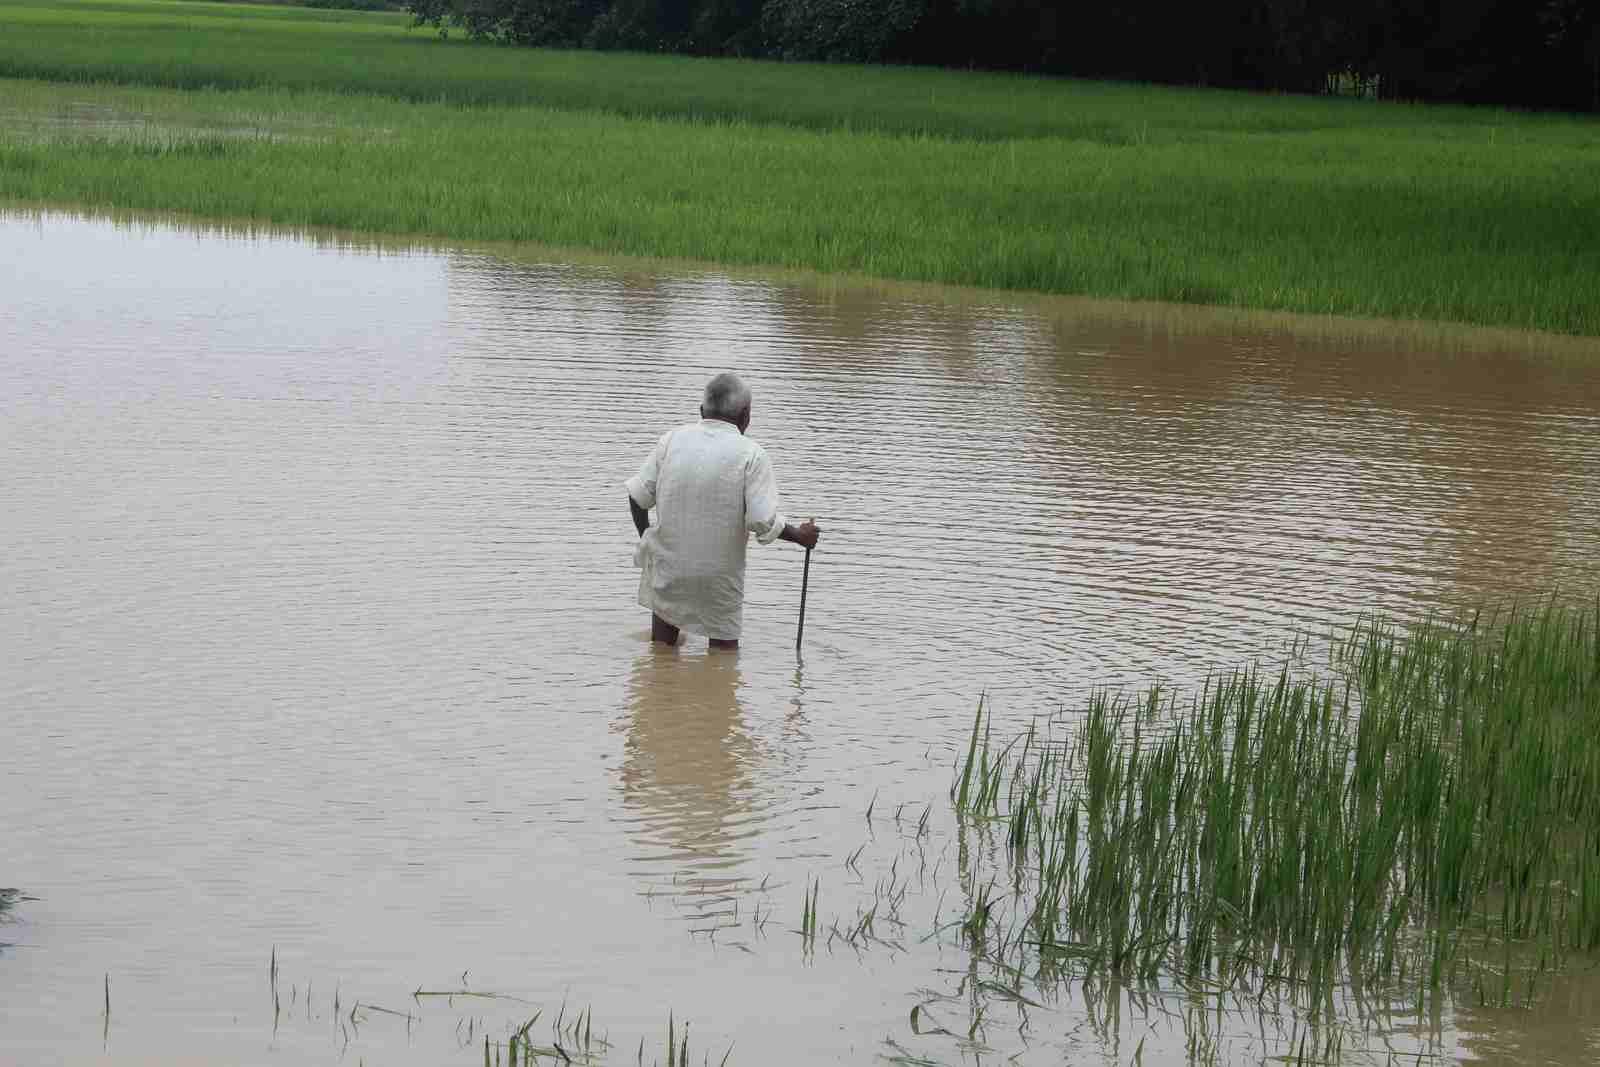 BANGLADESH: Salesian Missionaries Providing Assistance in